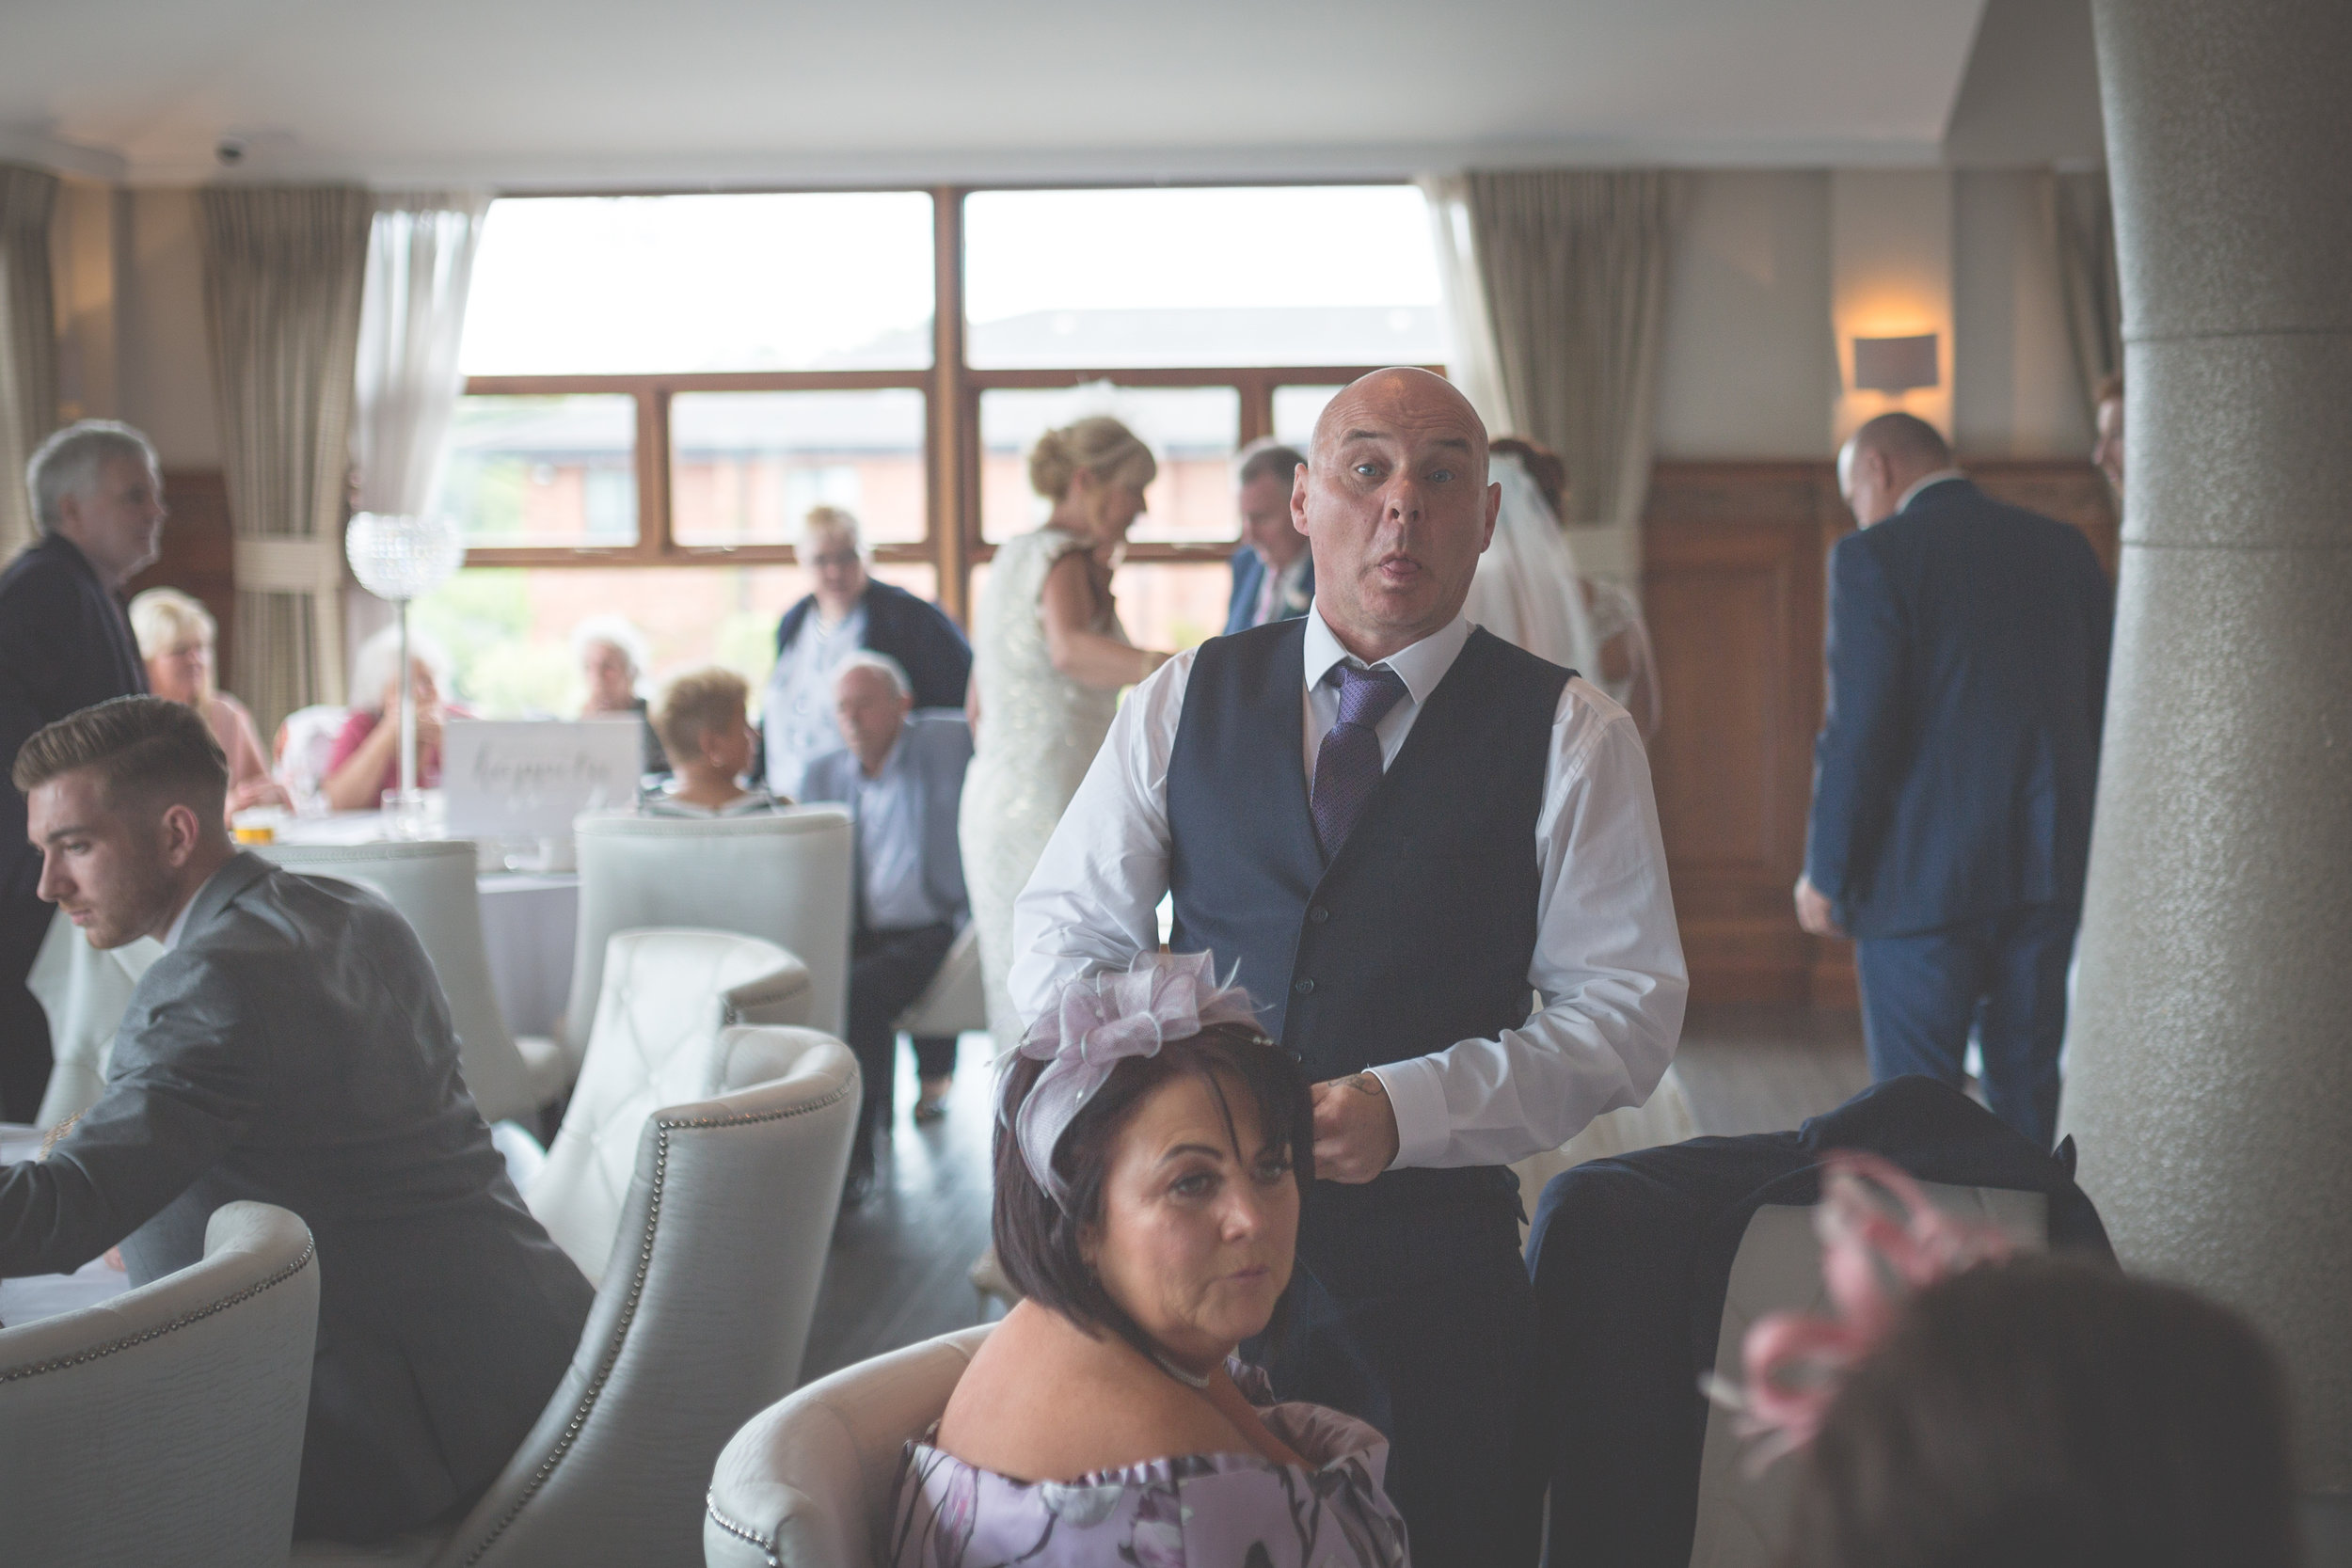 Antoinette & Stephen - Portraits   Brian McEwan Photography   Wedding Photographer Northern Ireland 103.jpg